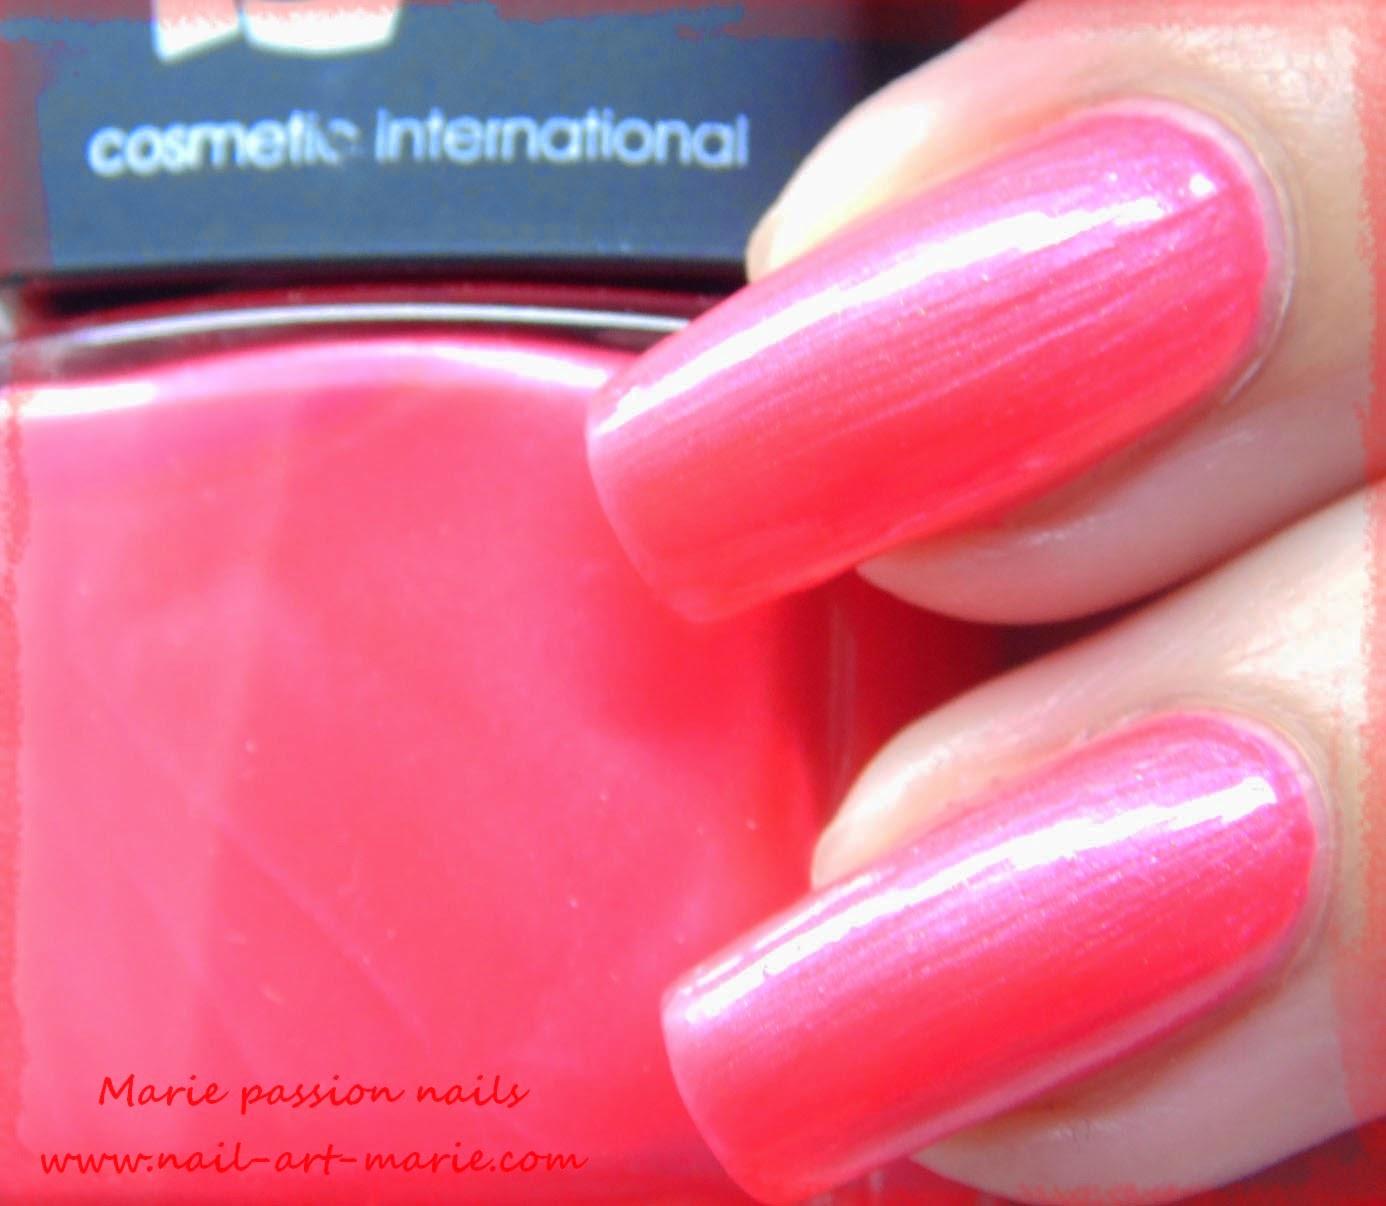 LM Cosmetic Fonte Nova4